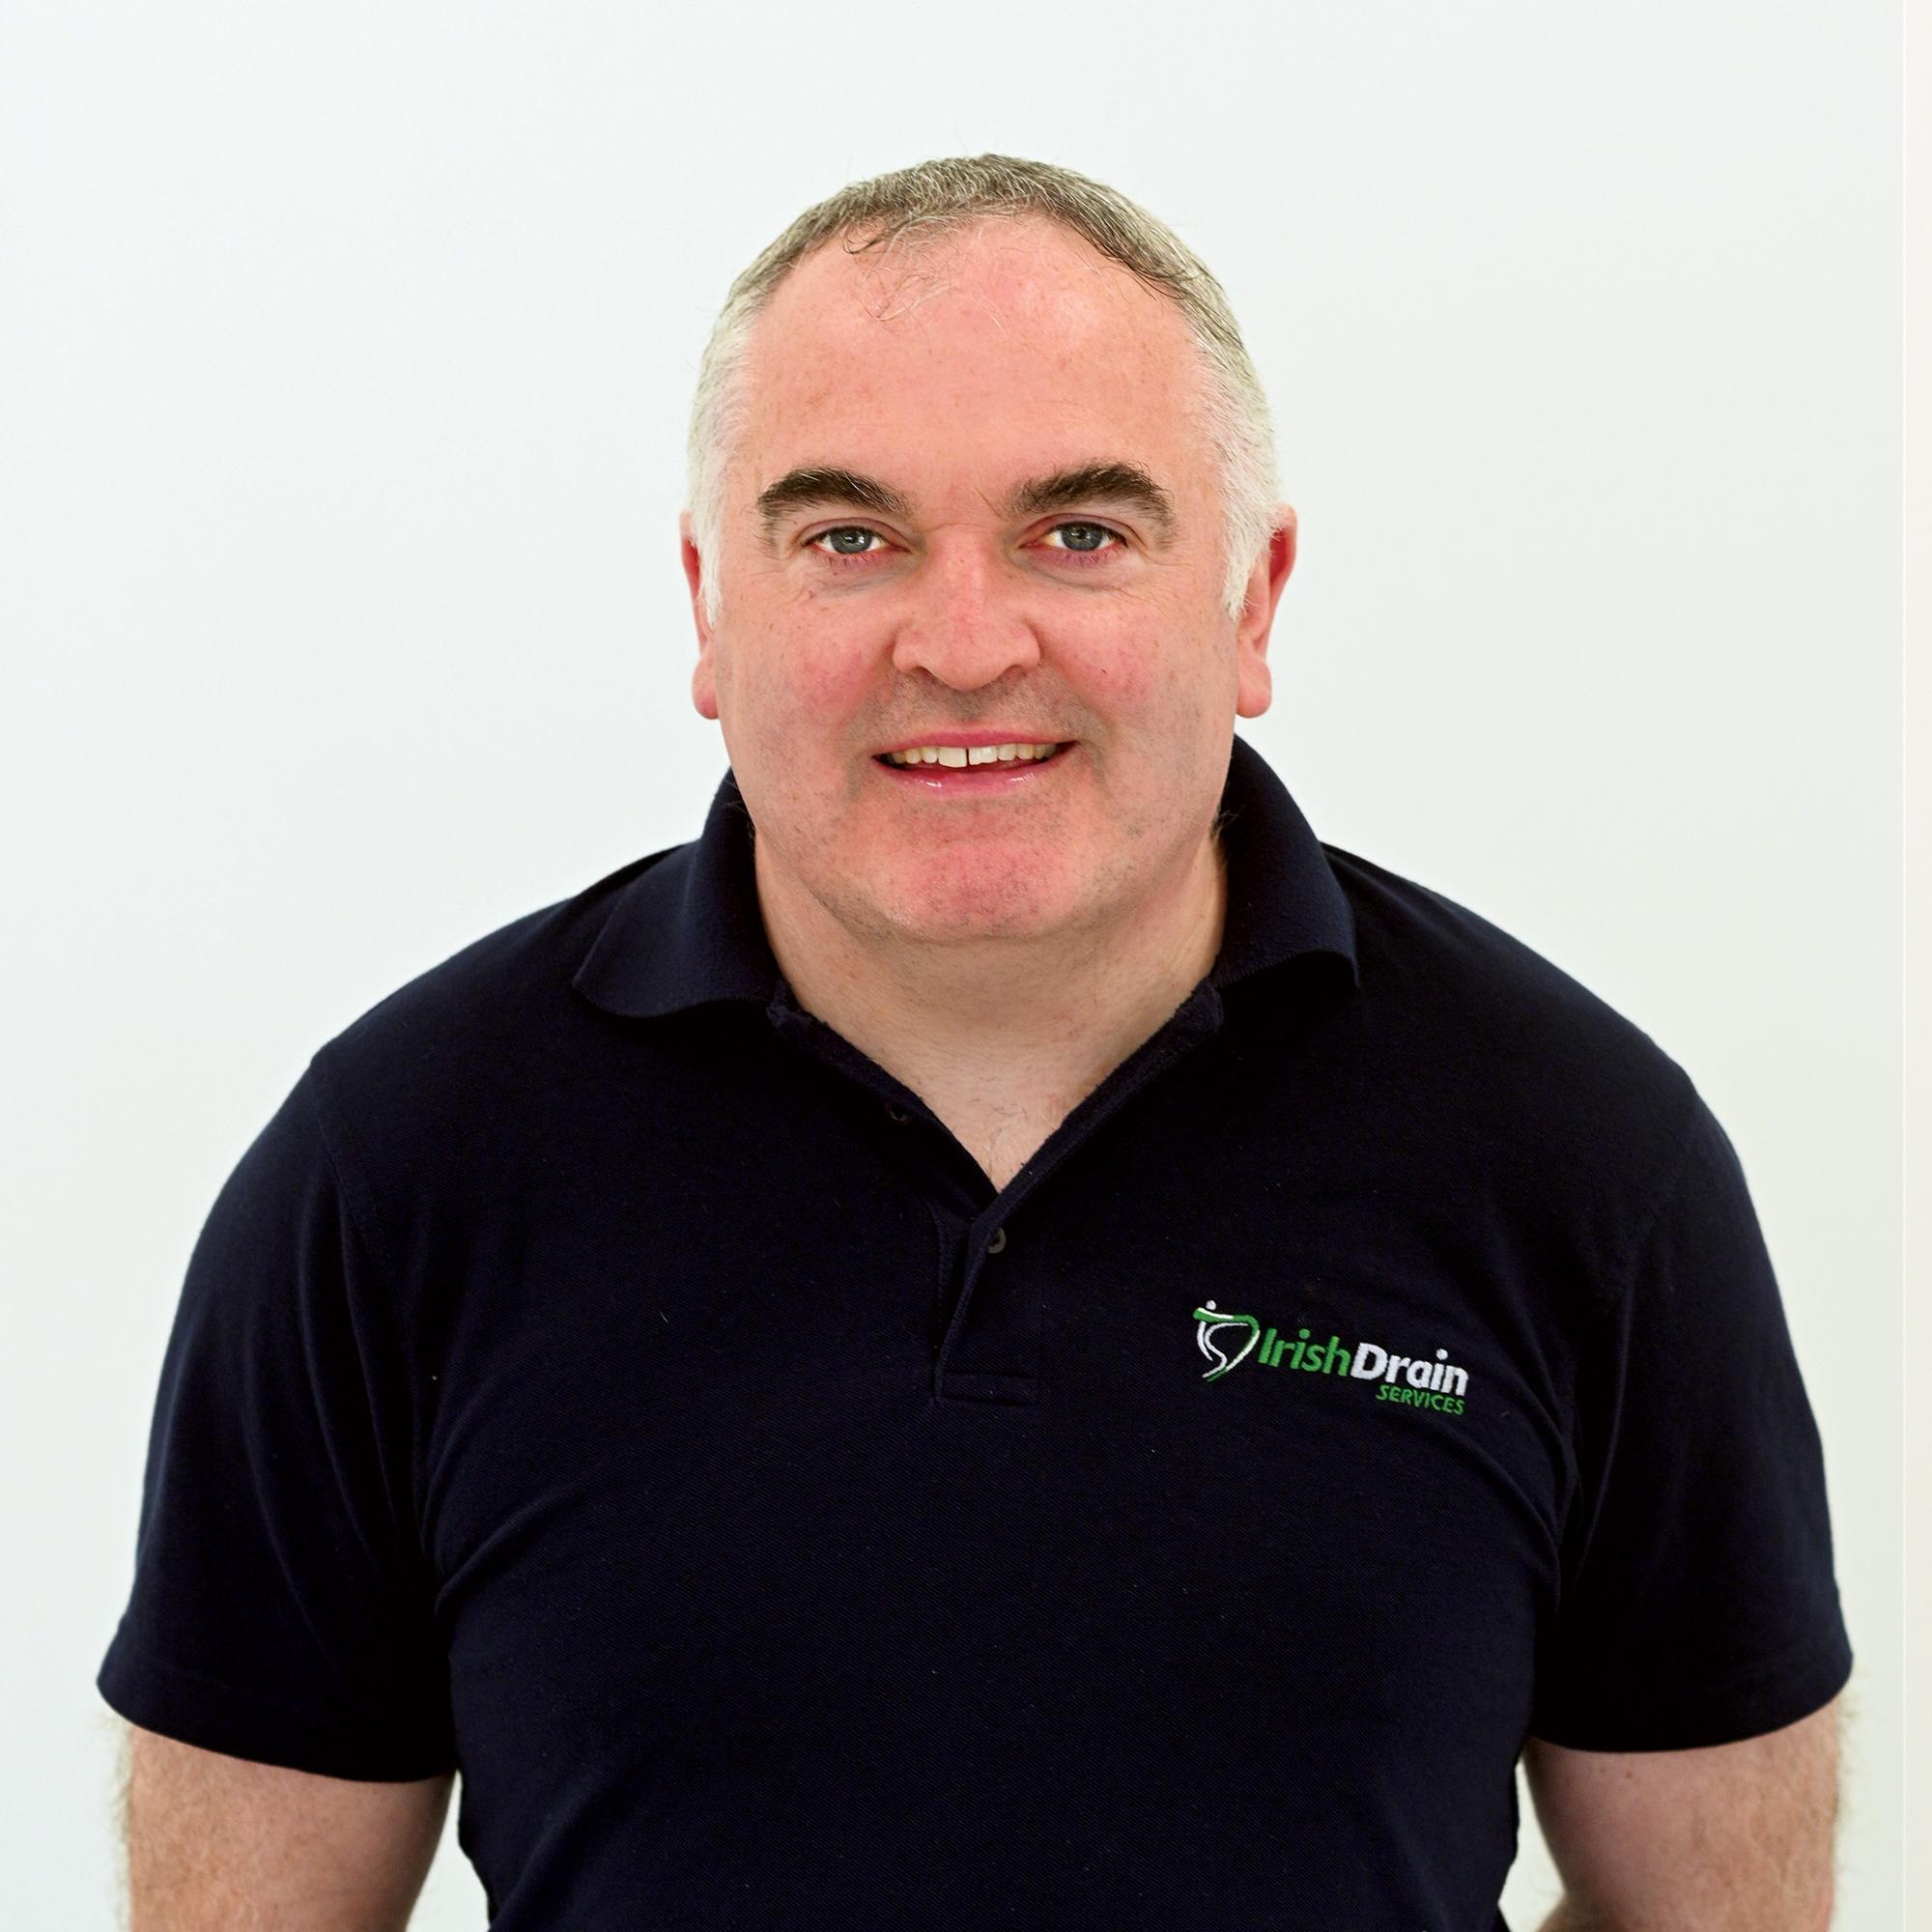 Liam Brosnan - Managing Director with Irish Drain Services